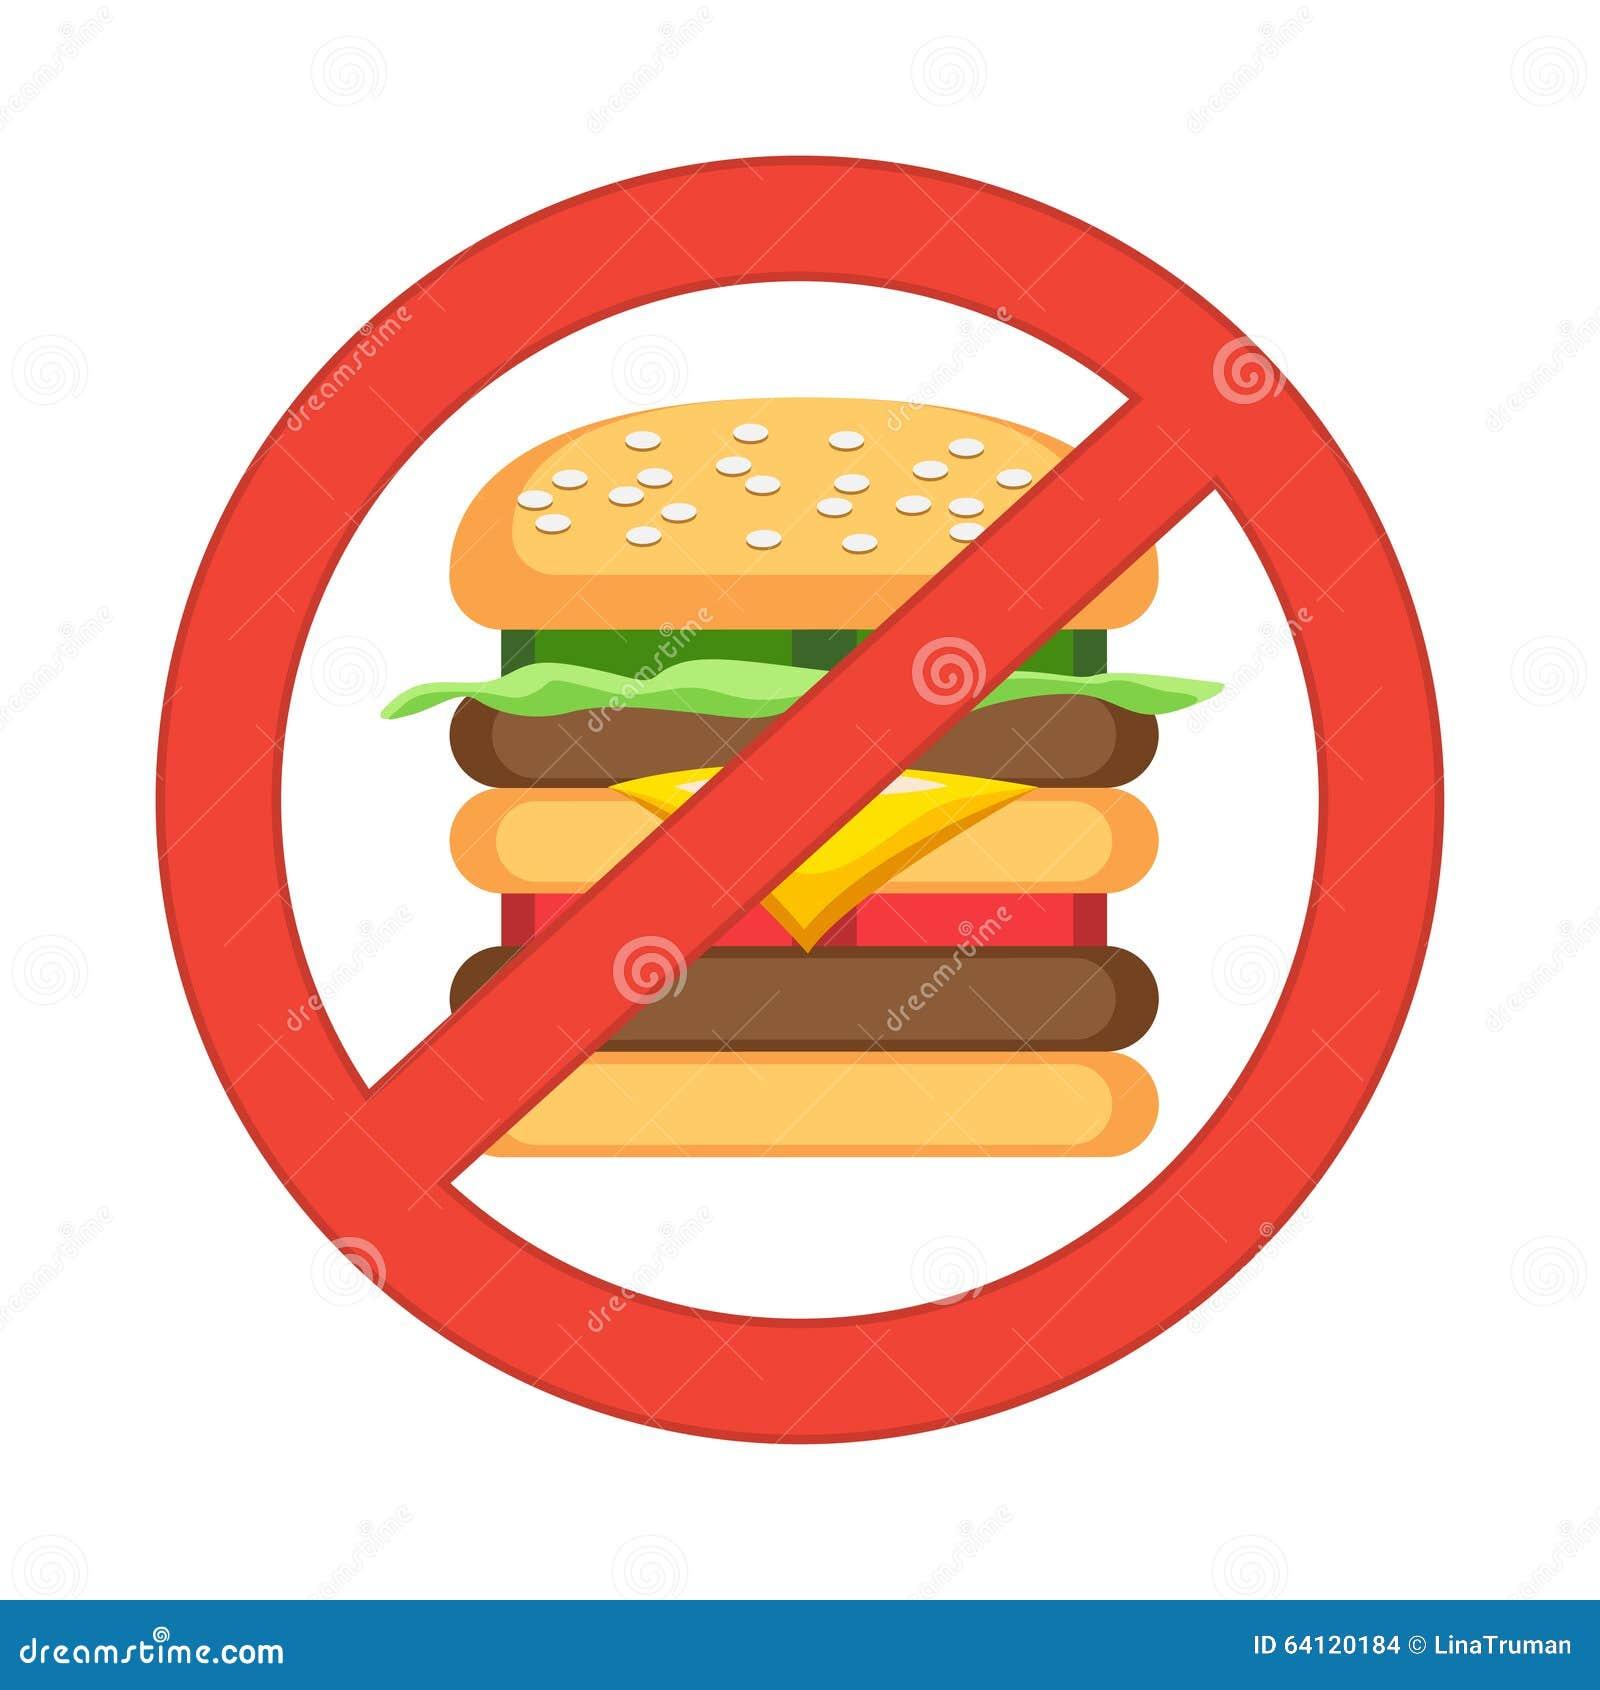 dangers of eating fast food